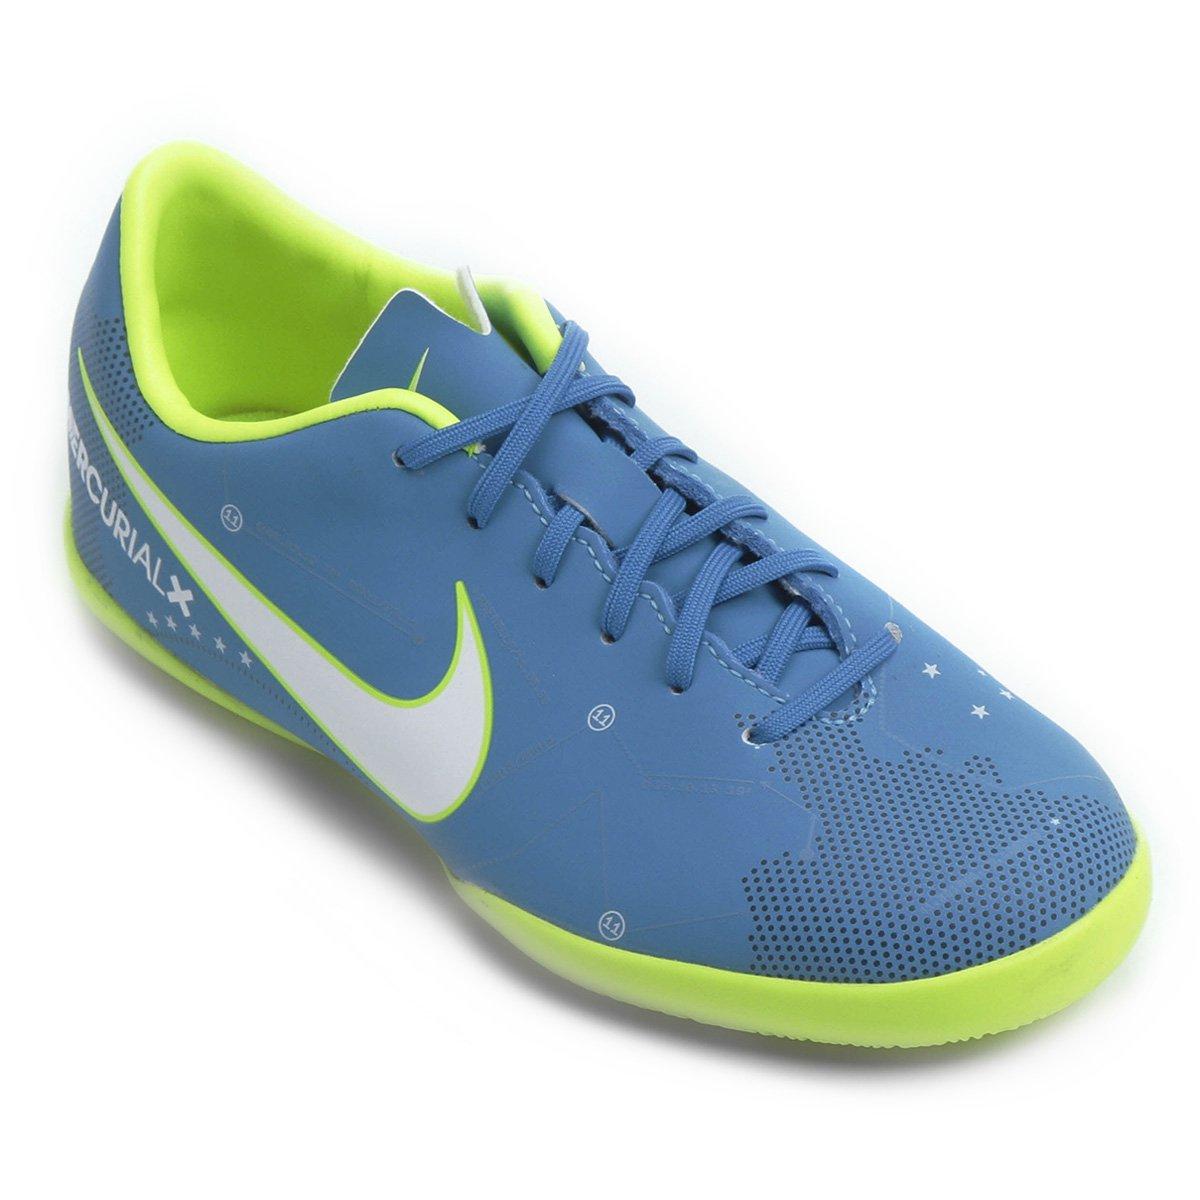 ce982182194e9 ... inexpensive o produto chuteira futsal infantil nike mercurial victory 6  neymar jr ic azul e branco